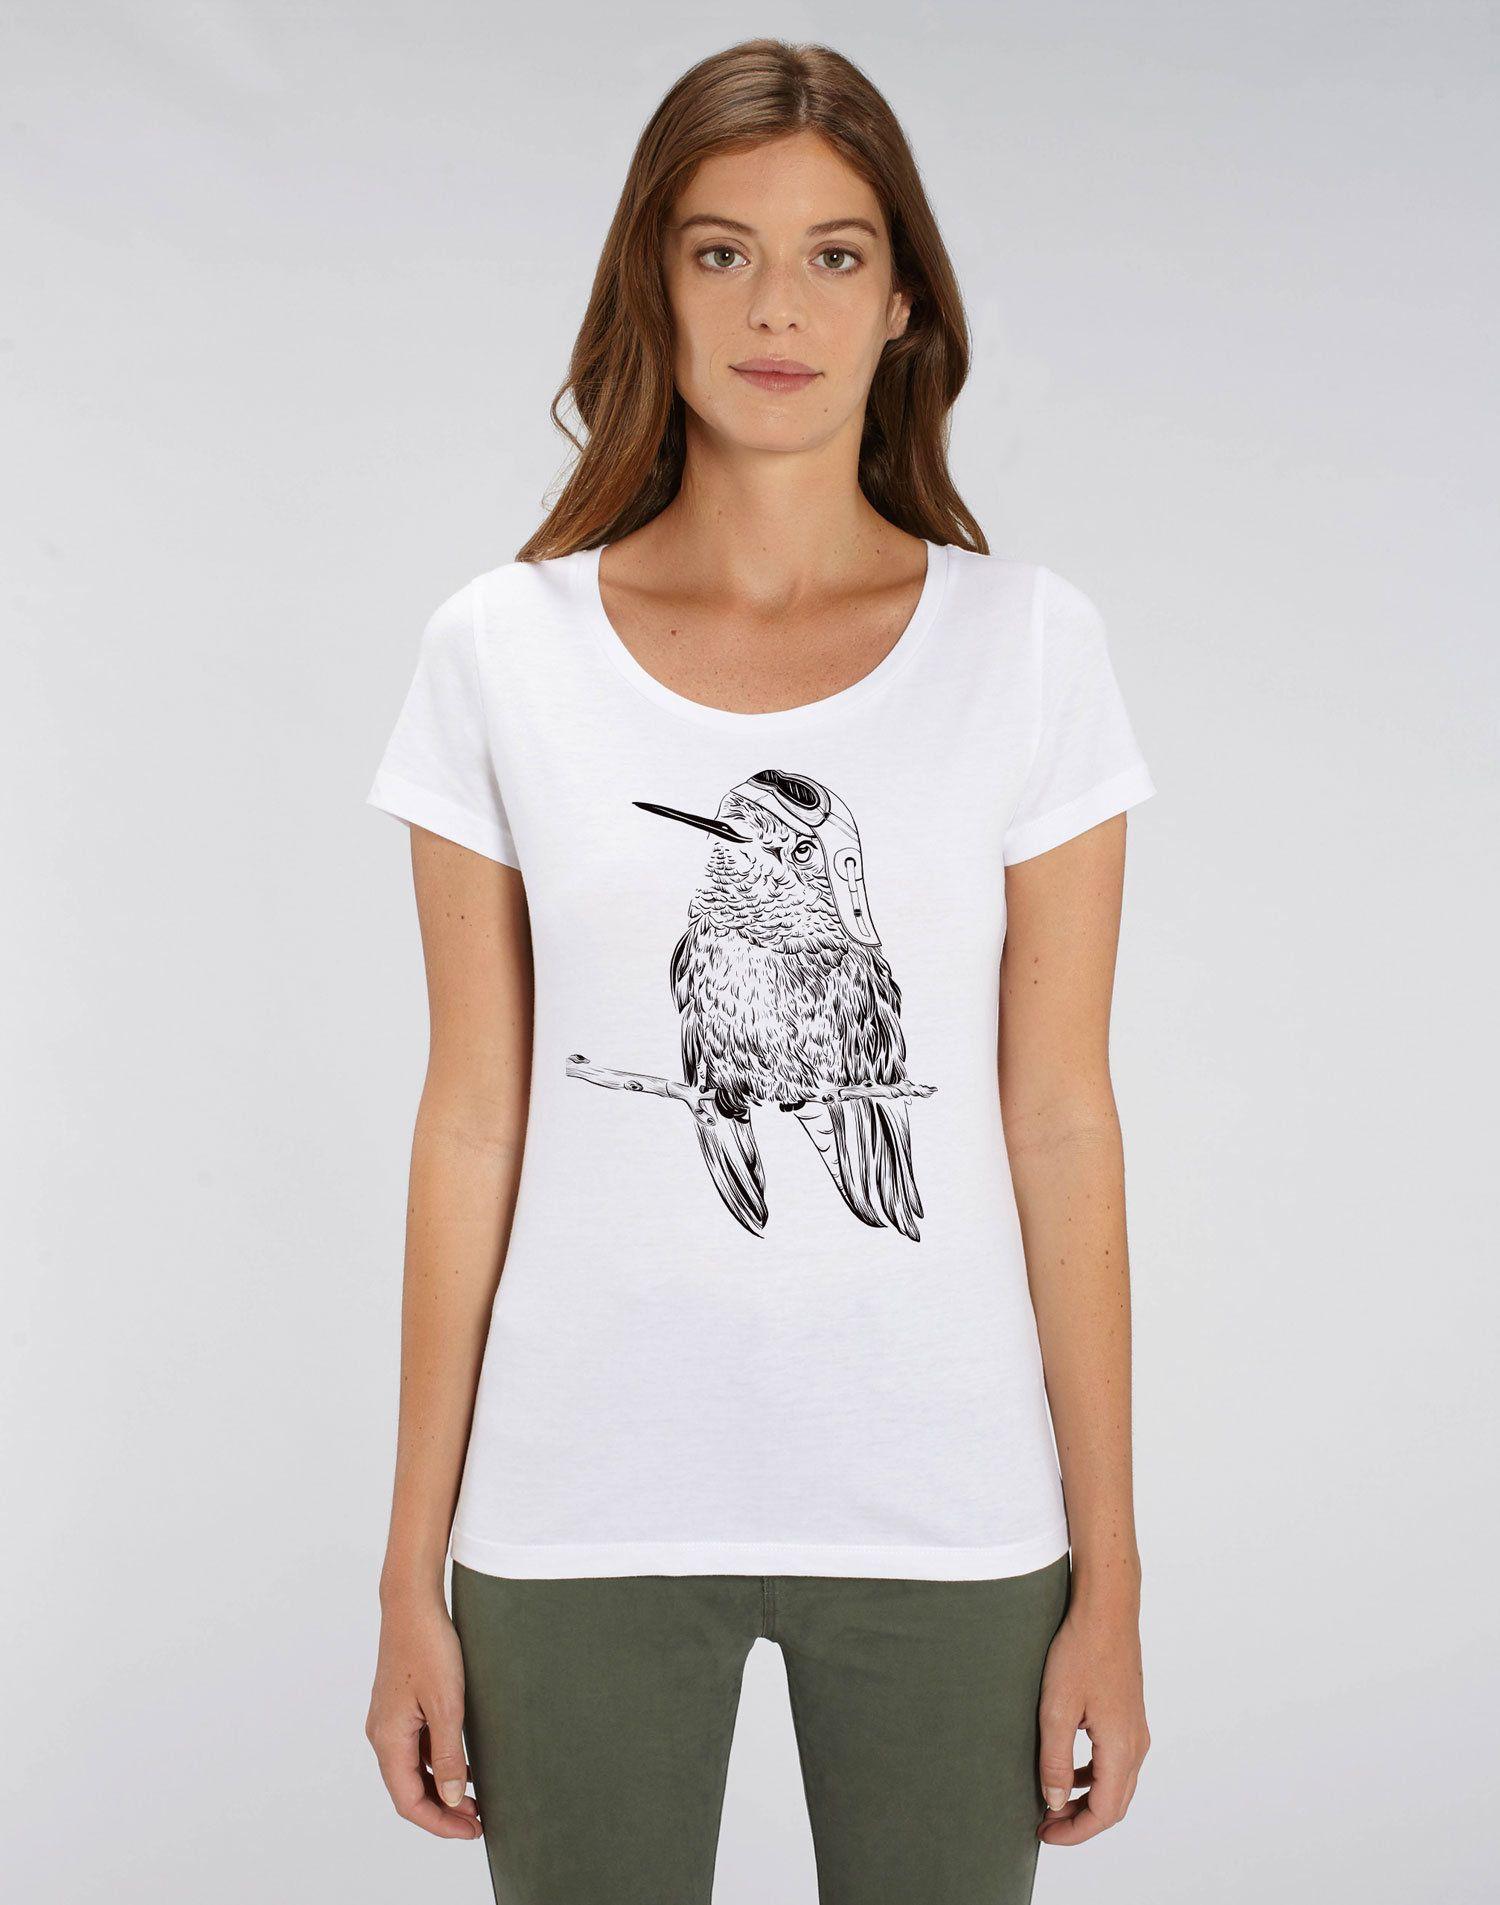 83c7f174f9d Bird Shirt With Glasses Tee Tshirt Animal Women in 2019